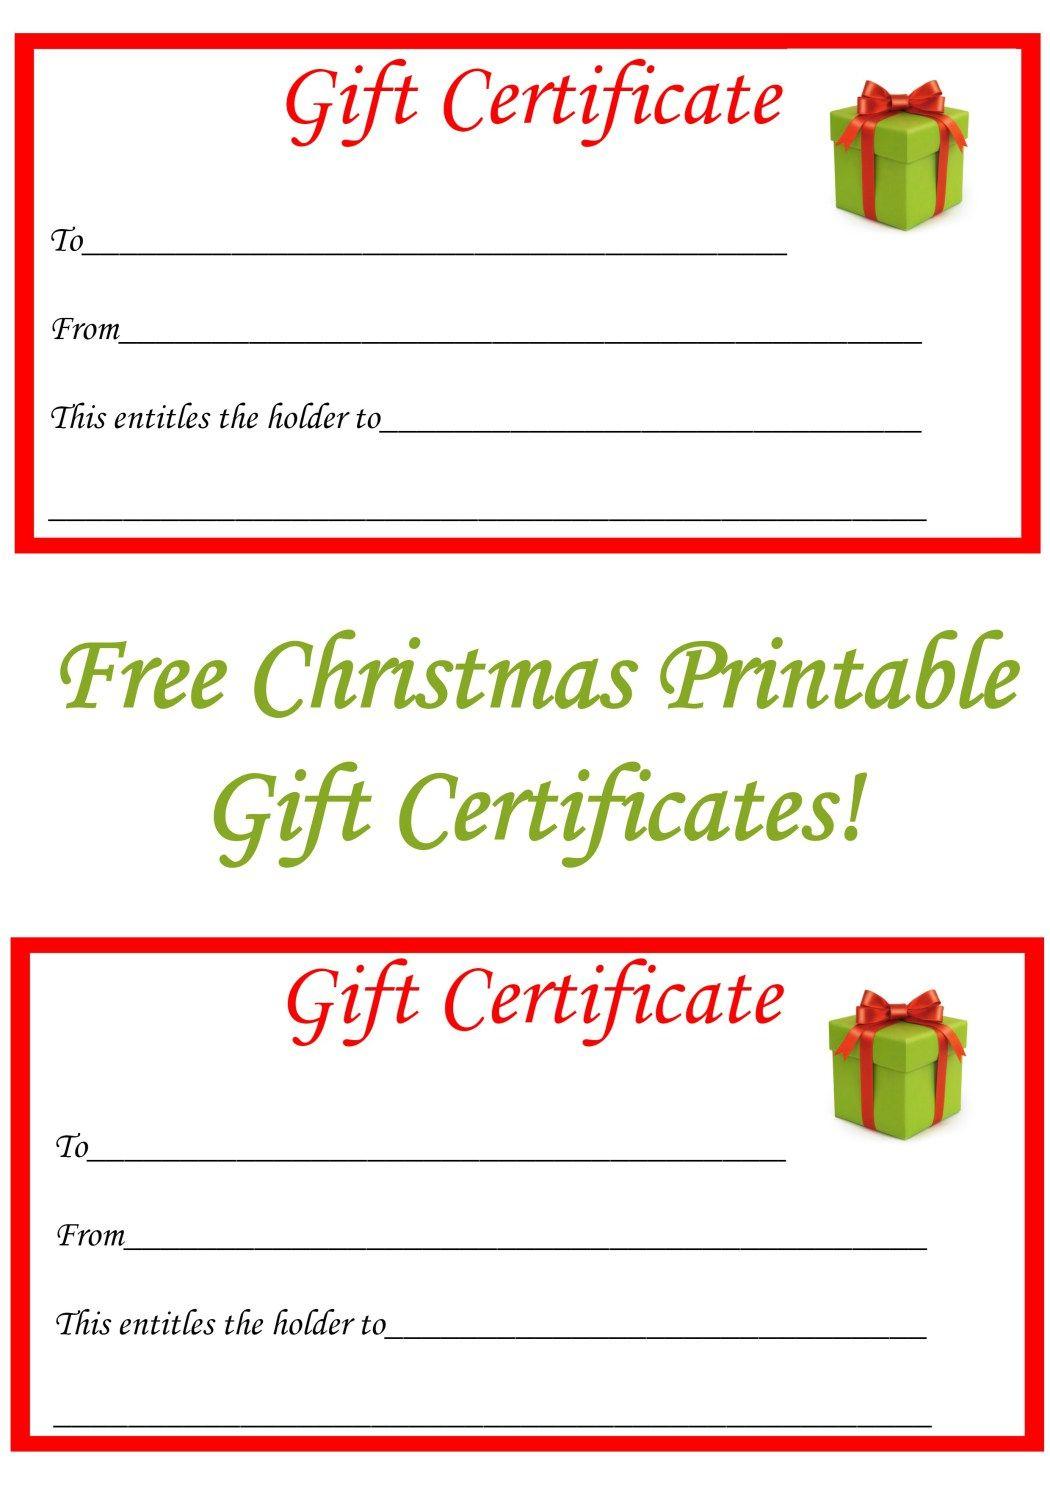 Free Christmas Printable Gift Certificates | Gift Ideas | Pinterest - Free Printable Gift Coupons